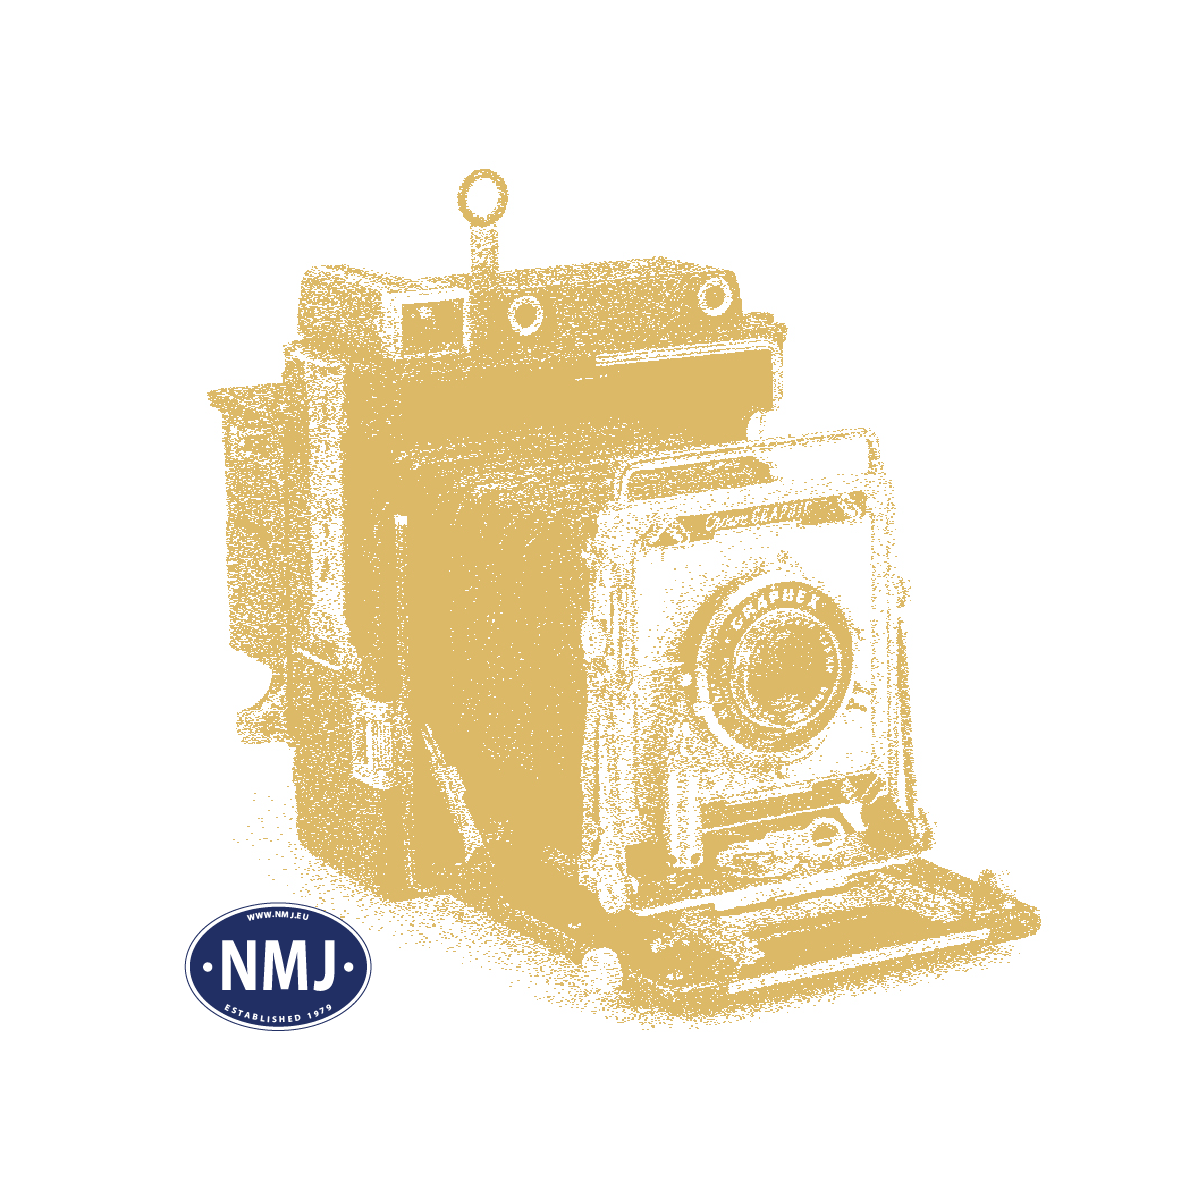 NMJT83.212 - NMJ Topline NSB Skd 224.216, Rød/gul, DCC Digital